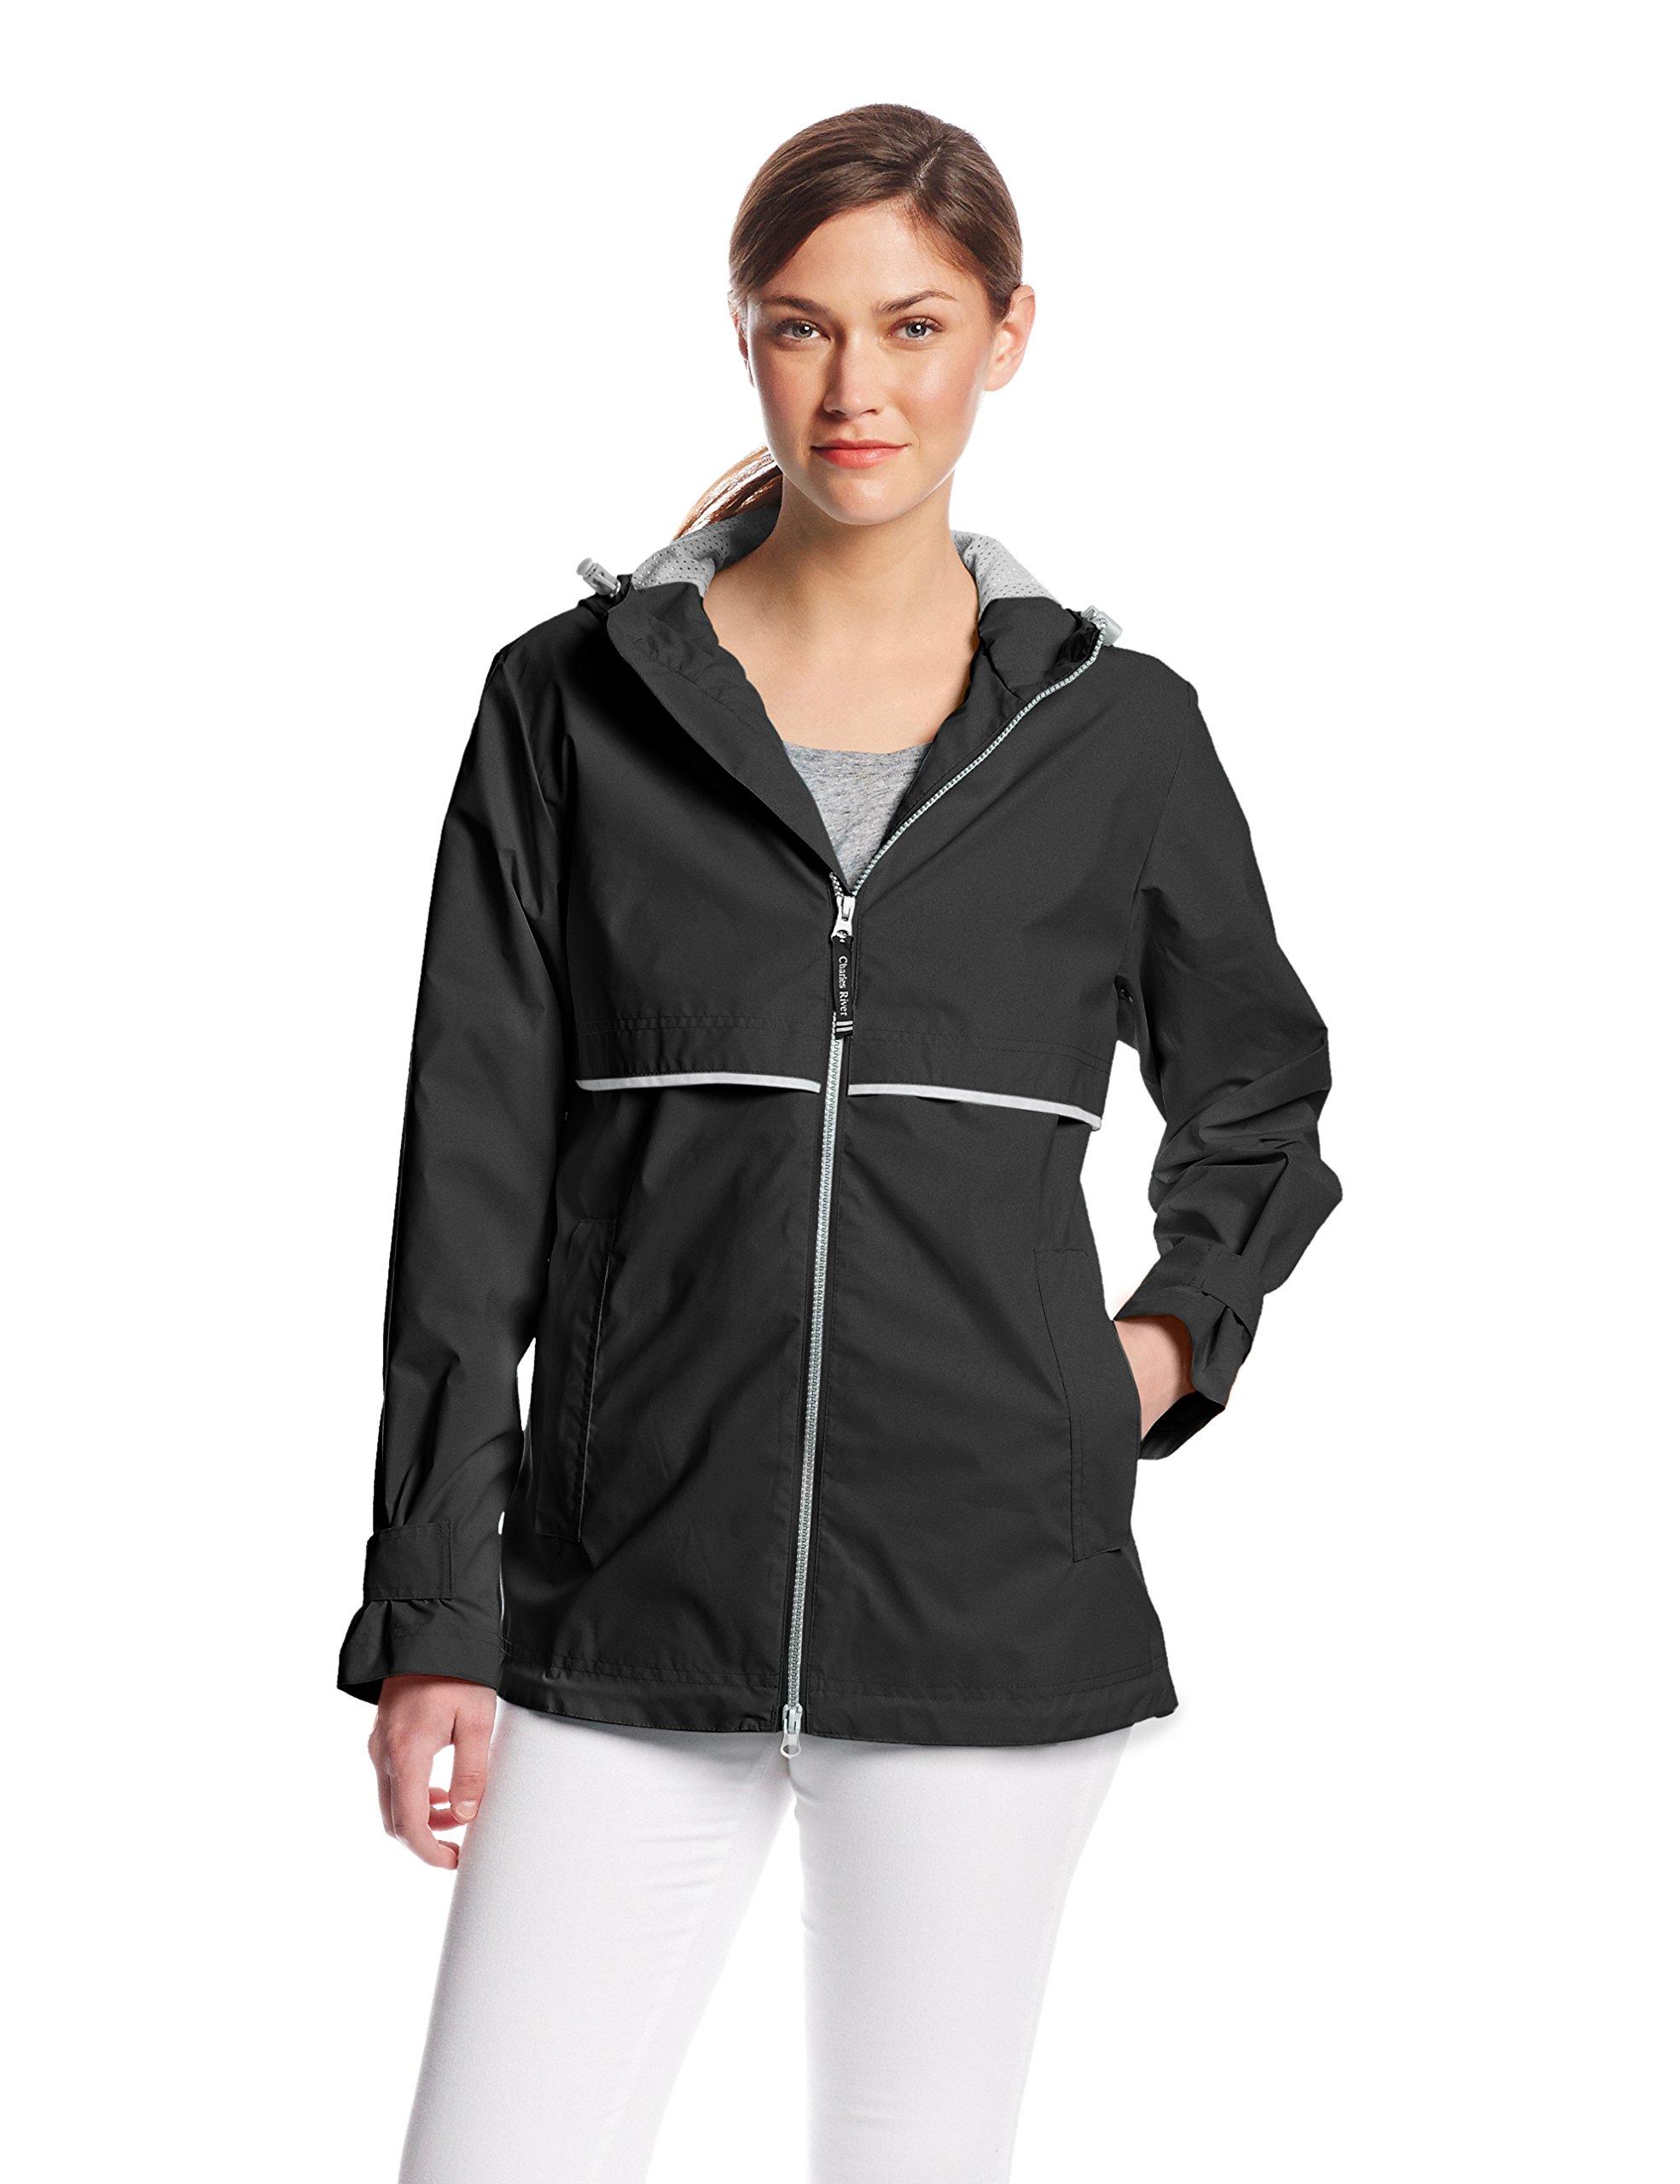 Charles River Apparel Women's New Englander Waterproof Rain Jacket, Black, 3X-Large